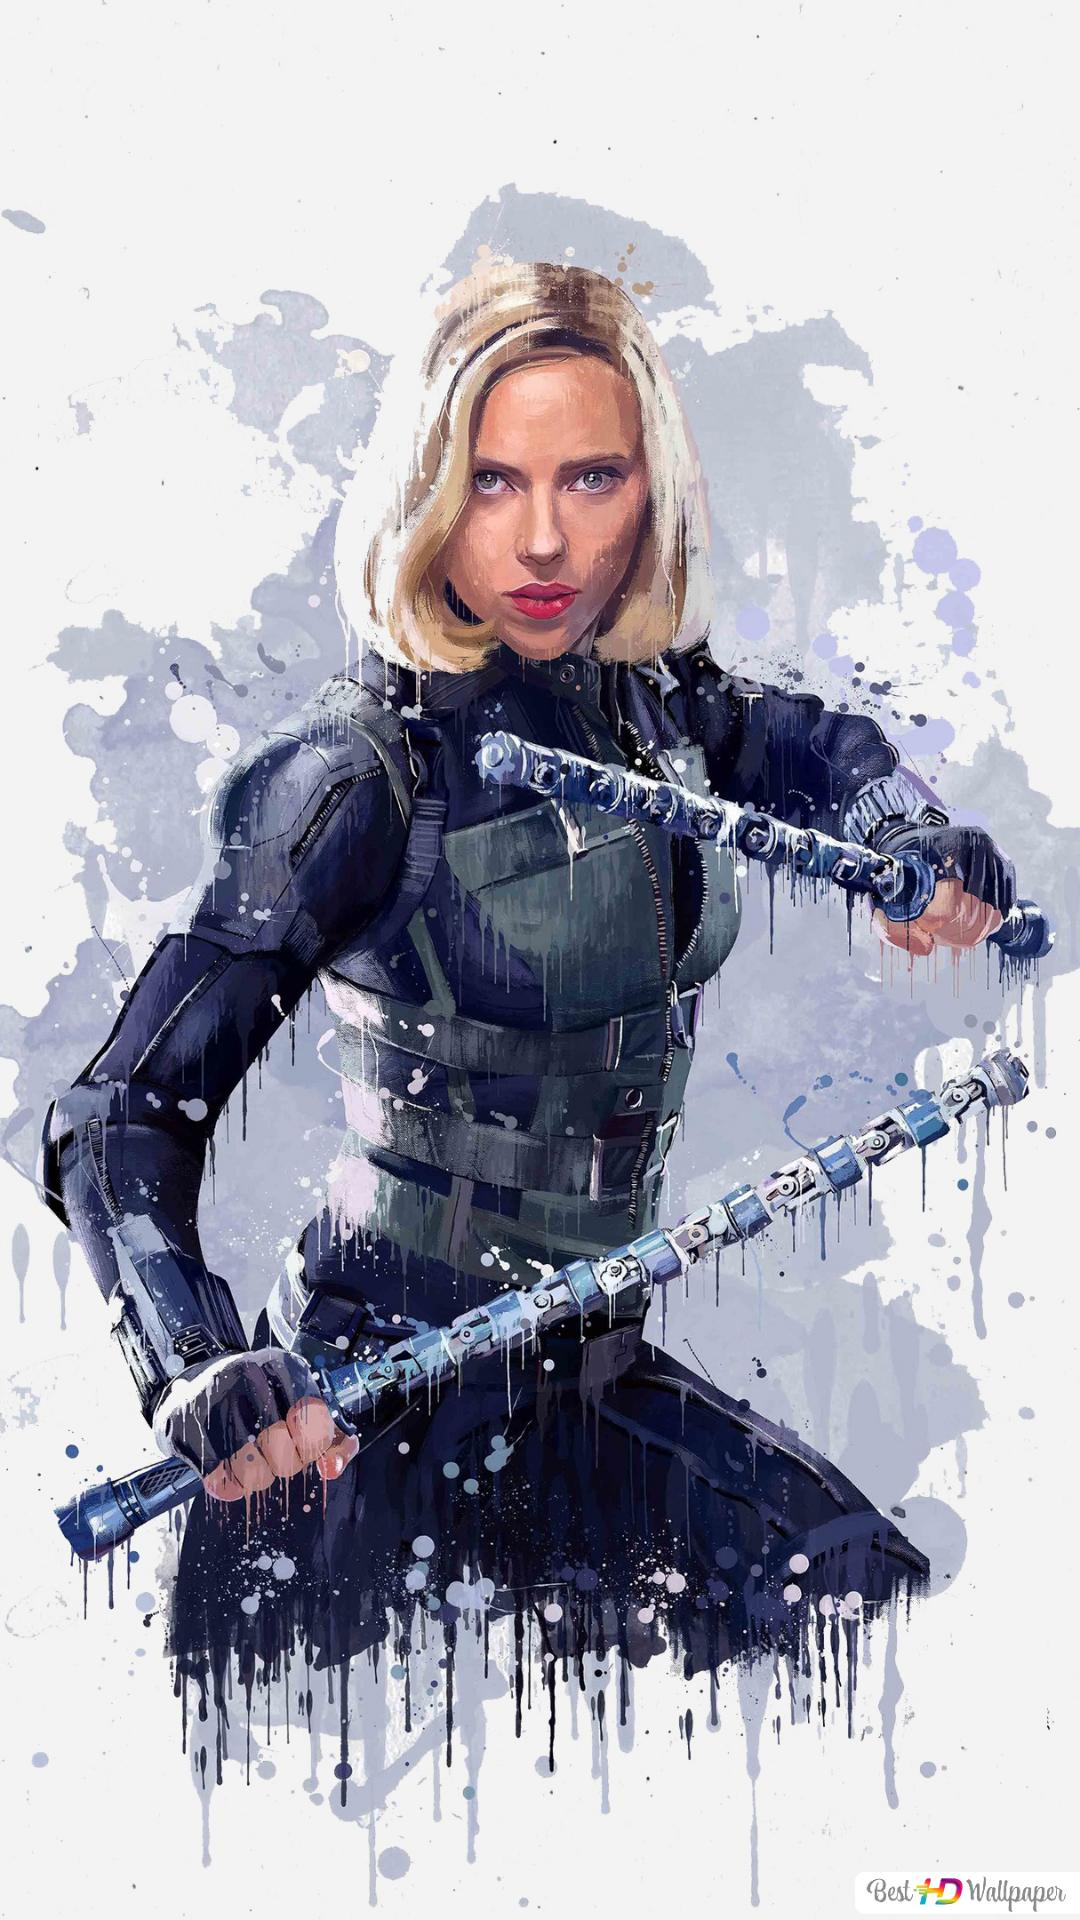 Black Widow Infinity War Hd Wallpaper Download